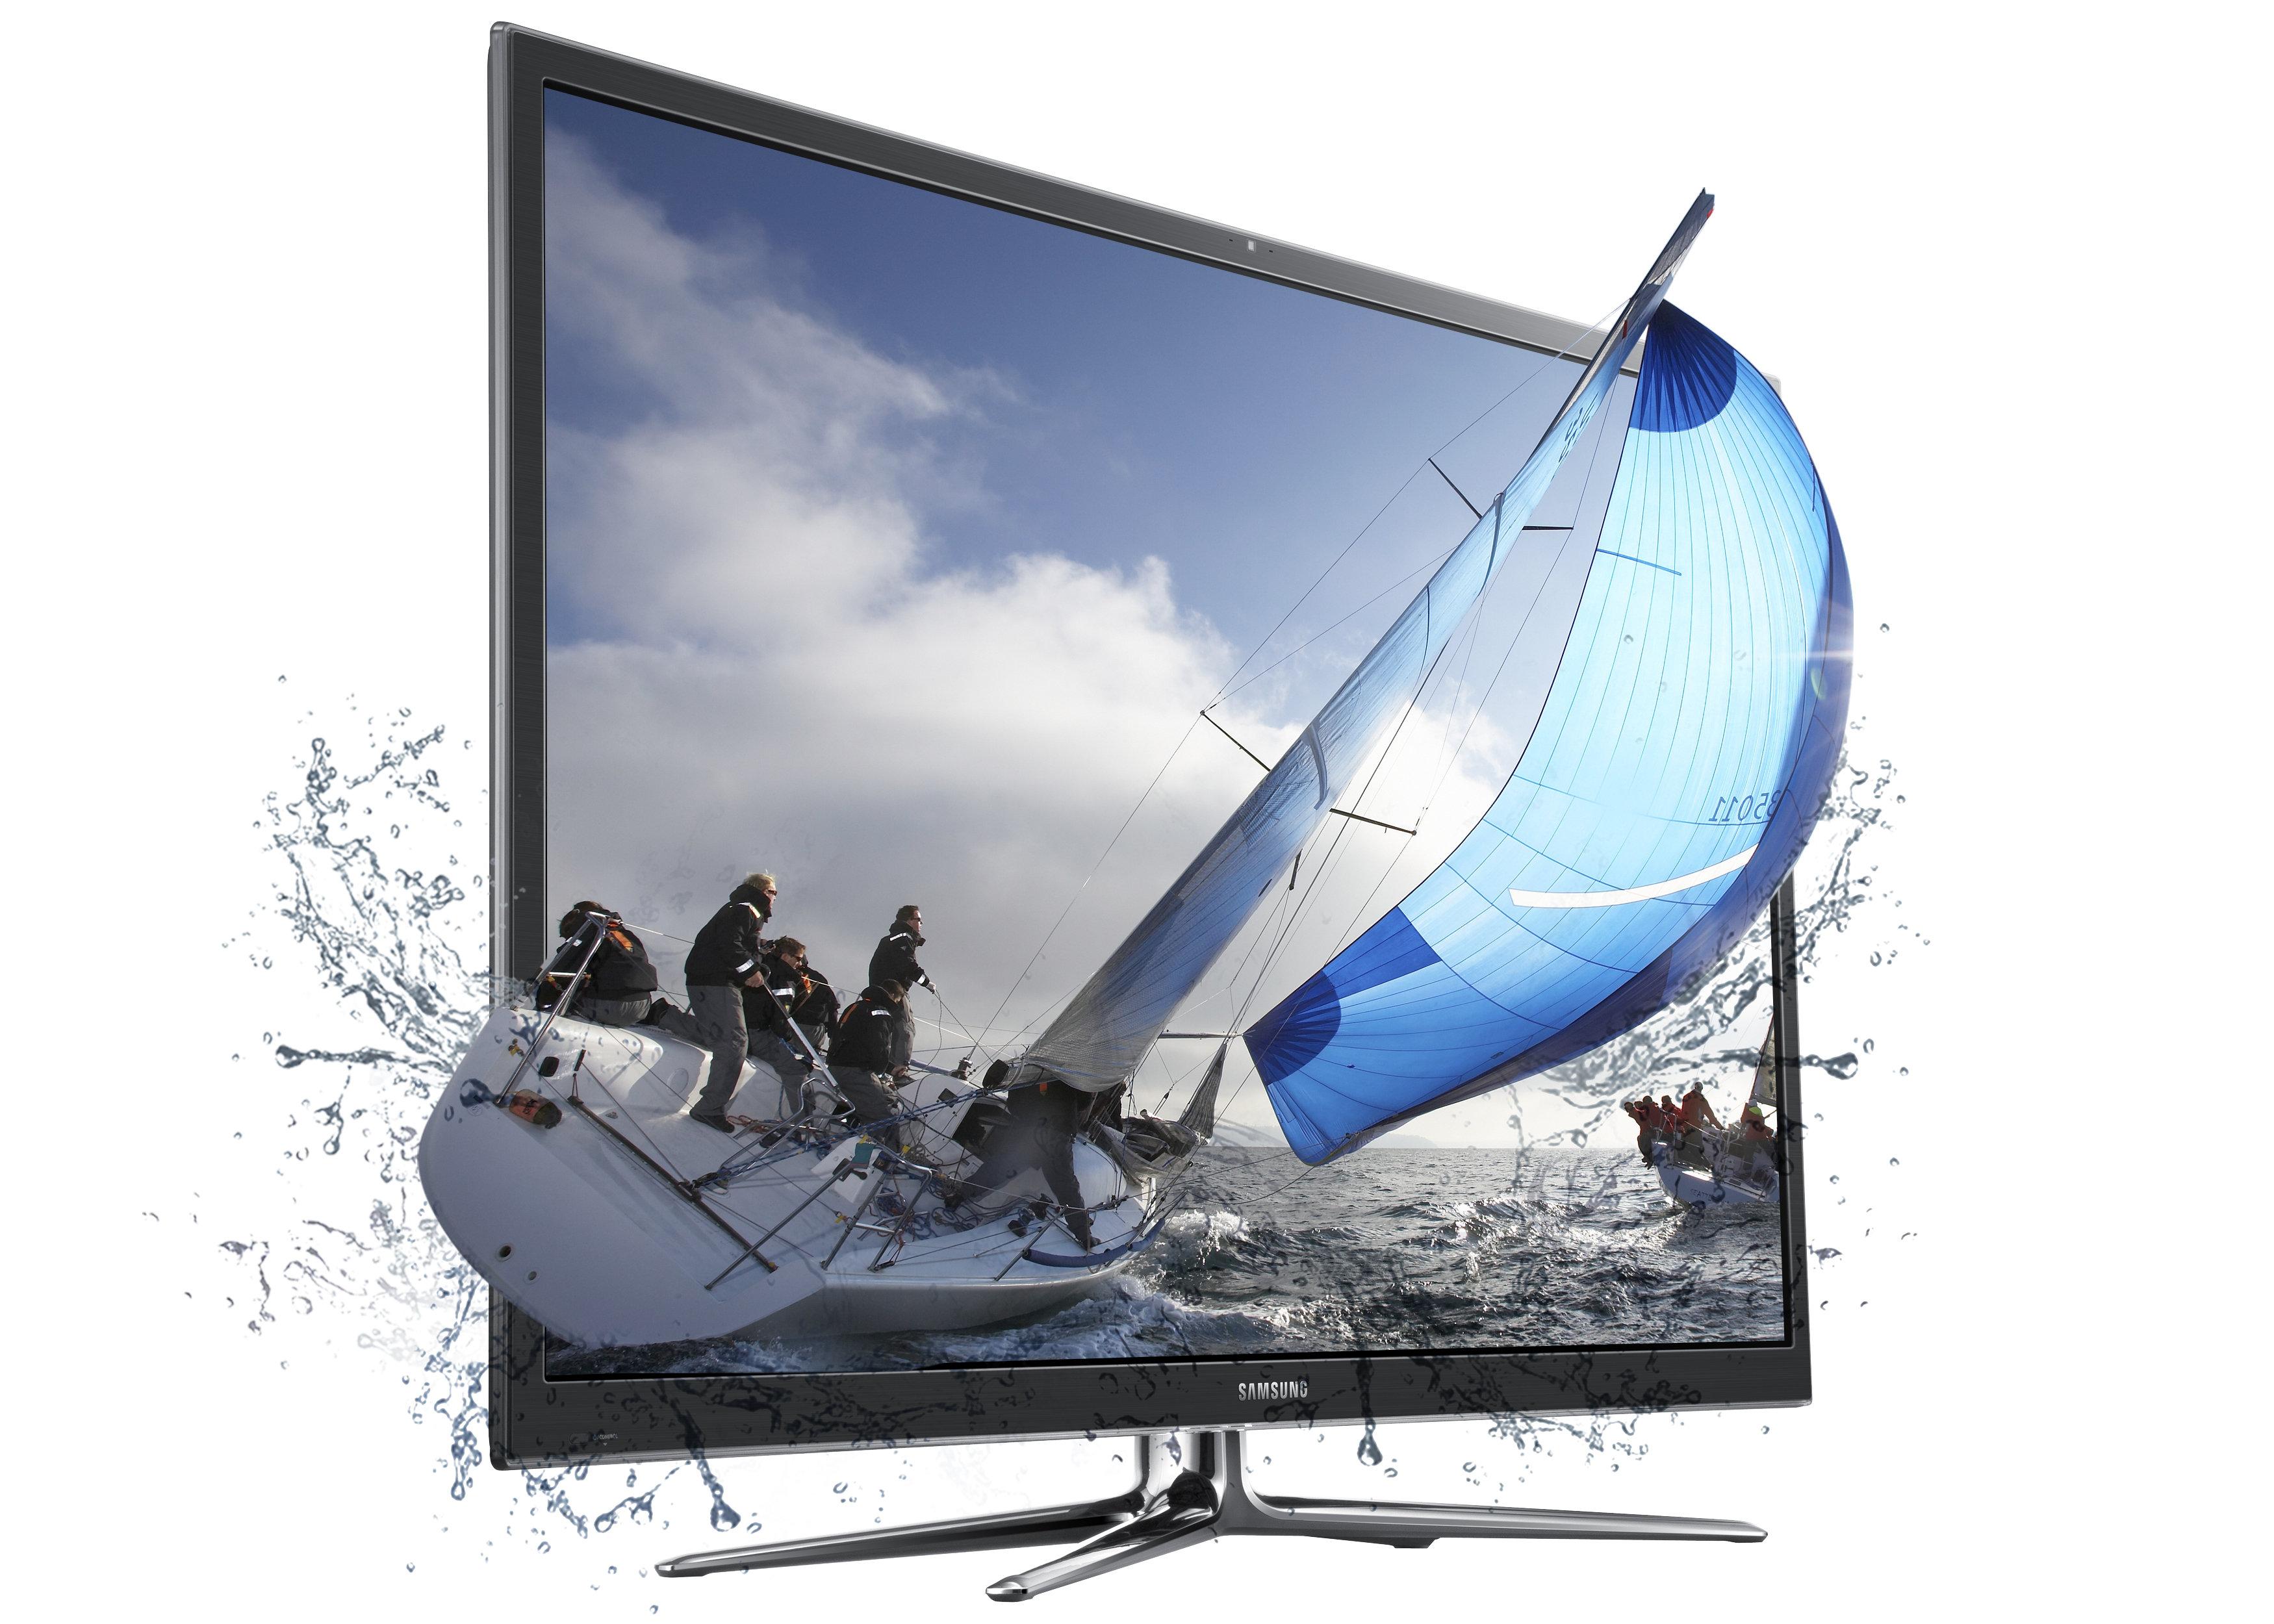 Amazon.com: Samsung PN64E7000 64-Inch 1080p 600Hz 3D Ultra ...